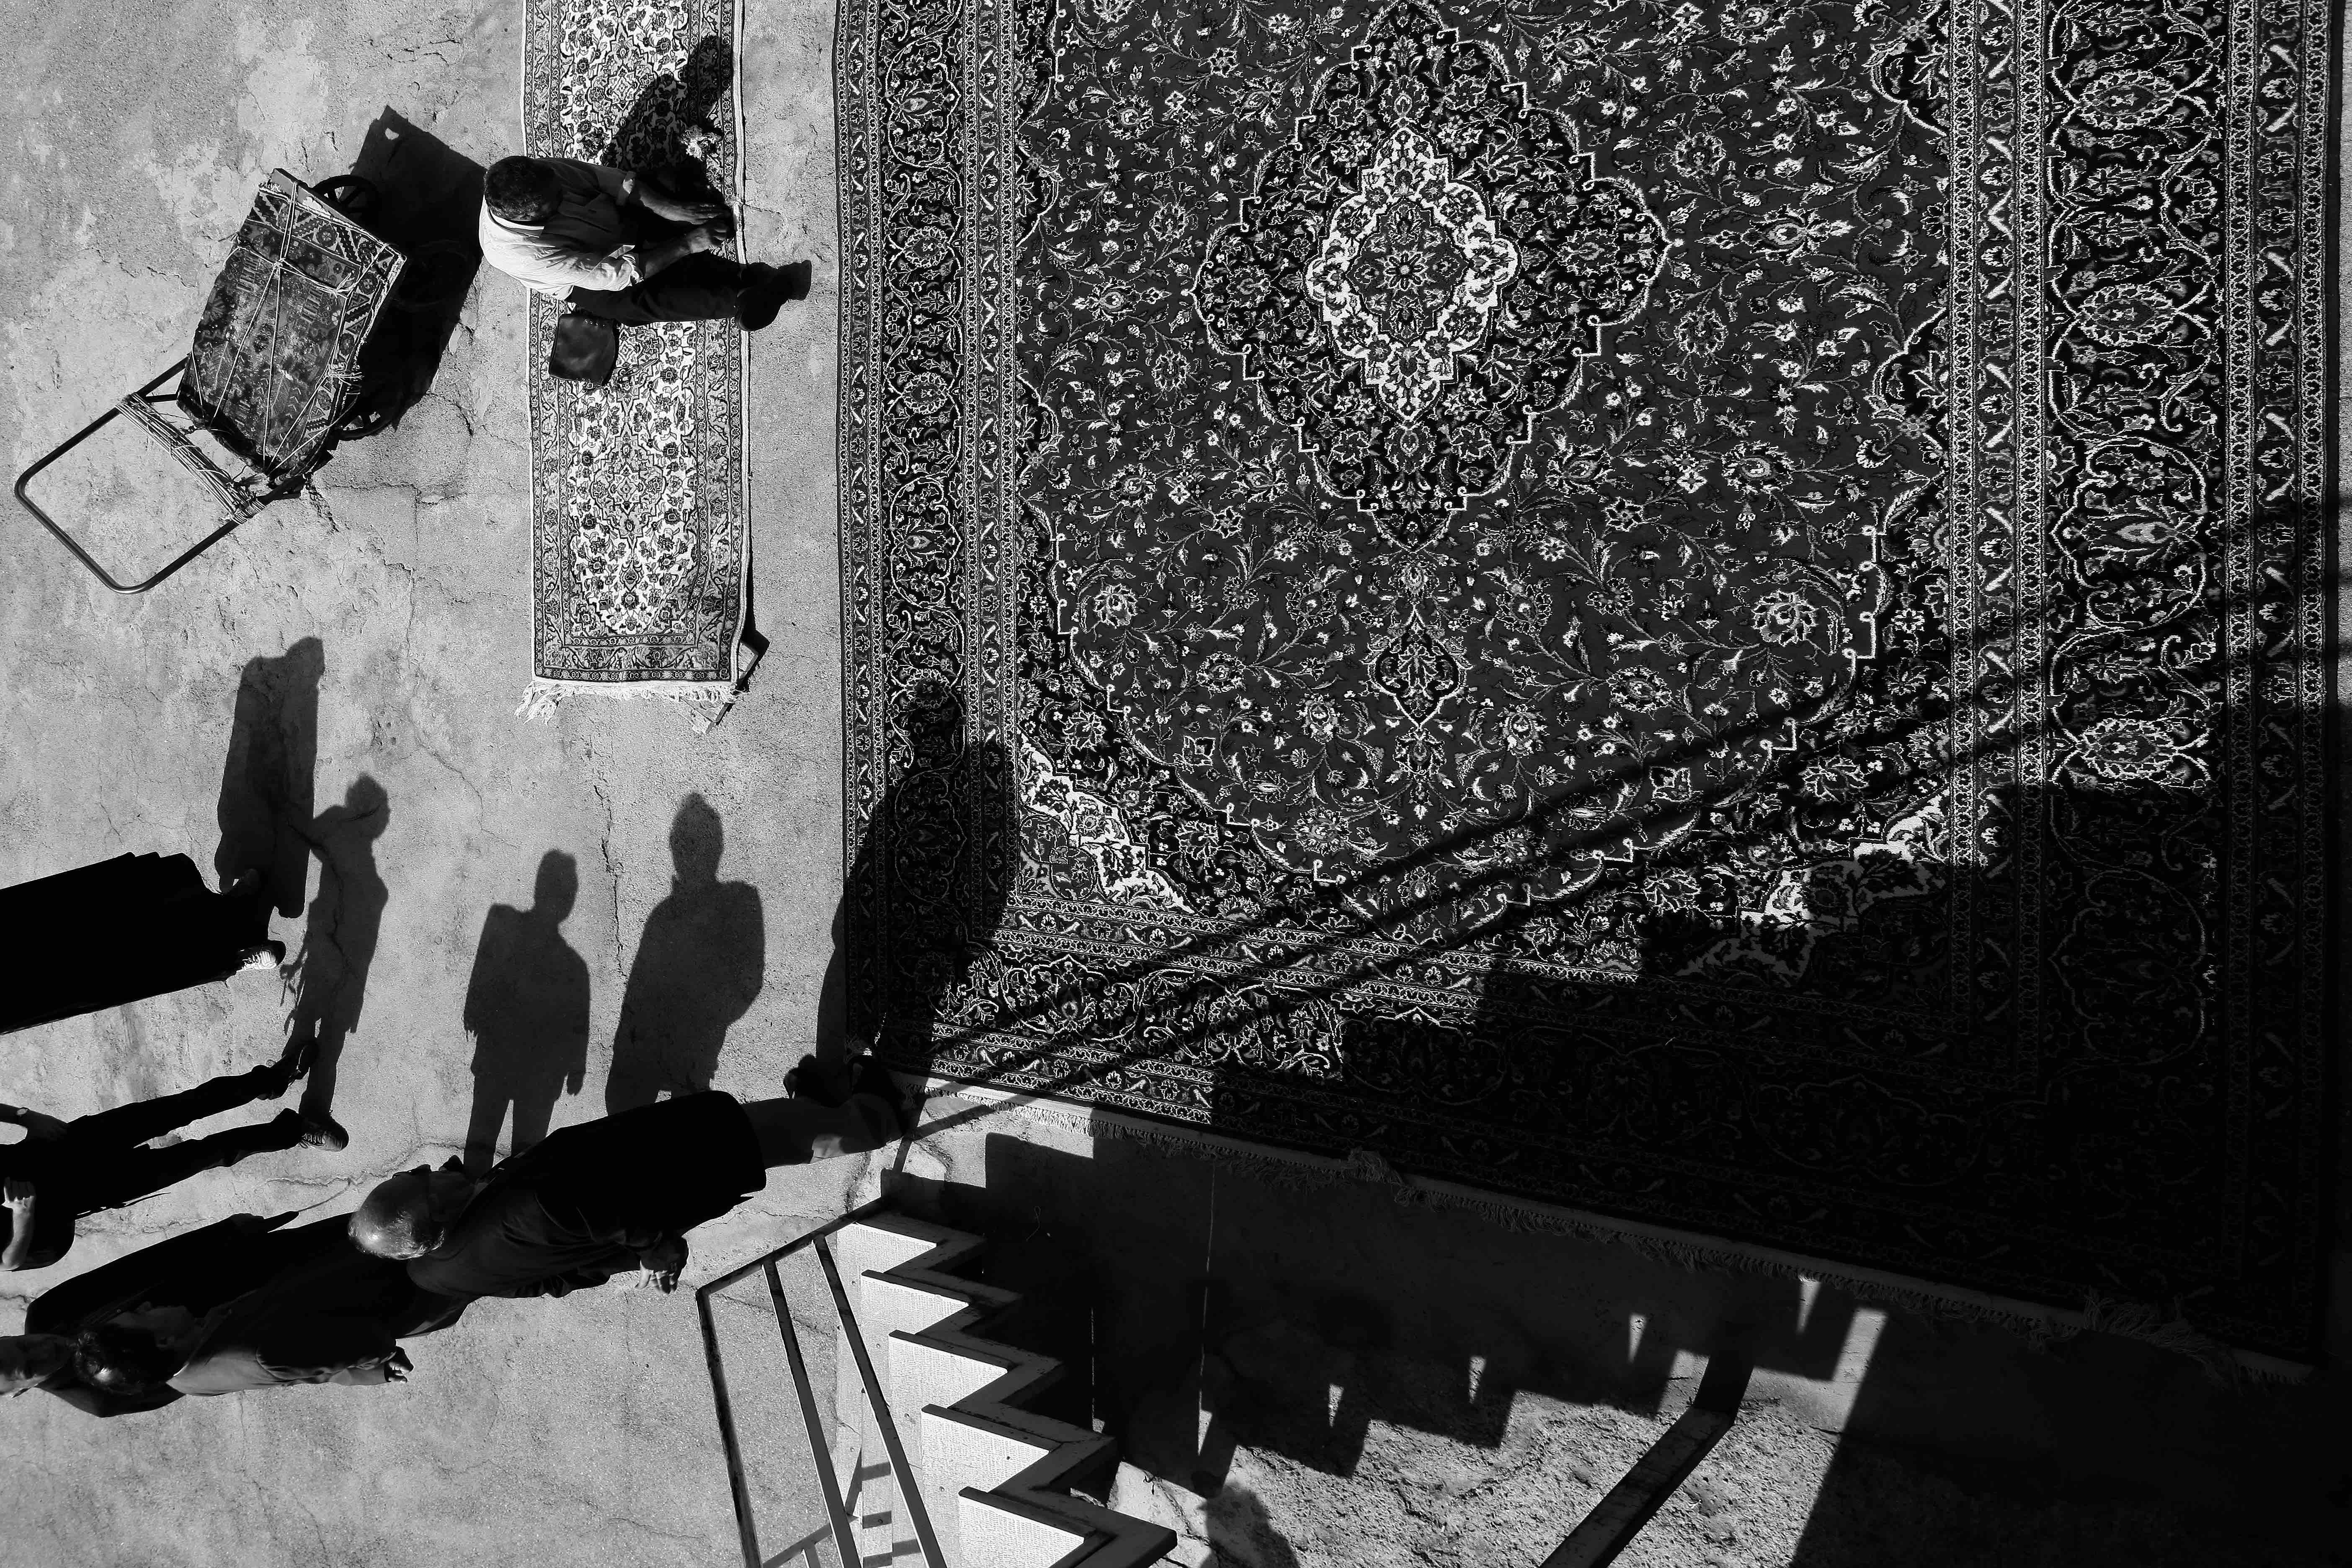 Untitled (3)_ The Life Of Shadows Series - Nehdaran_ Dana